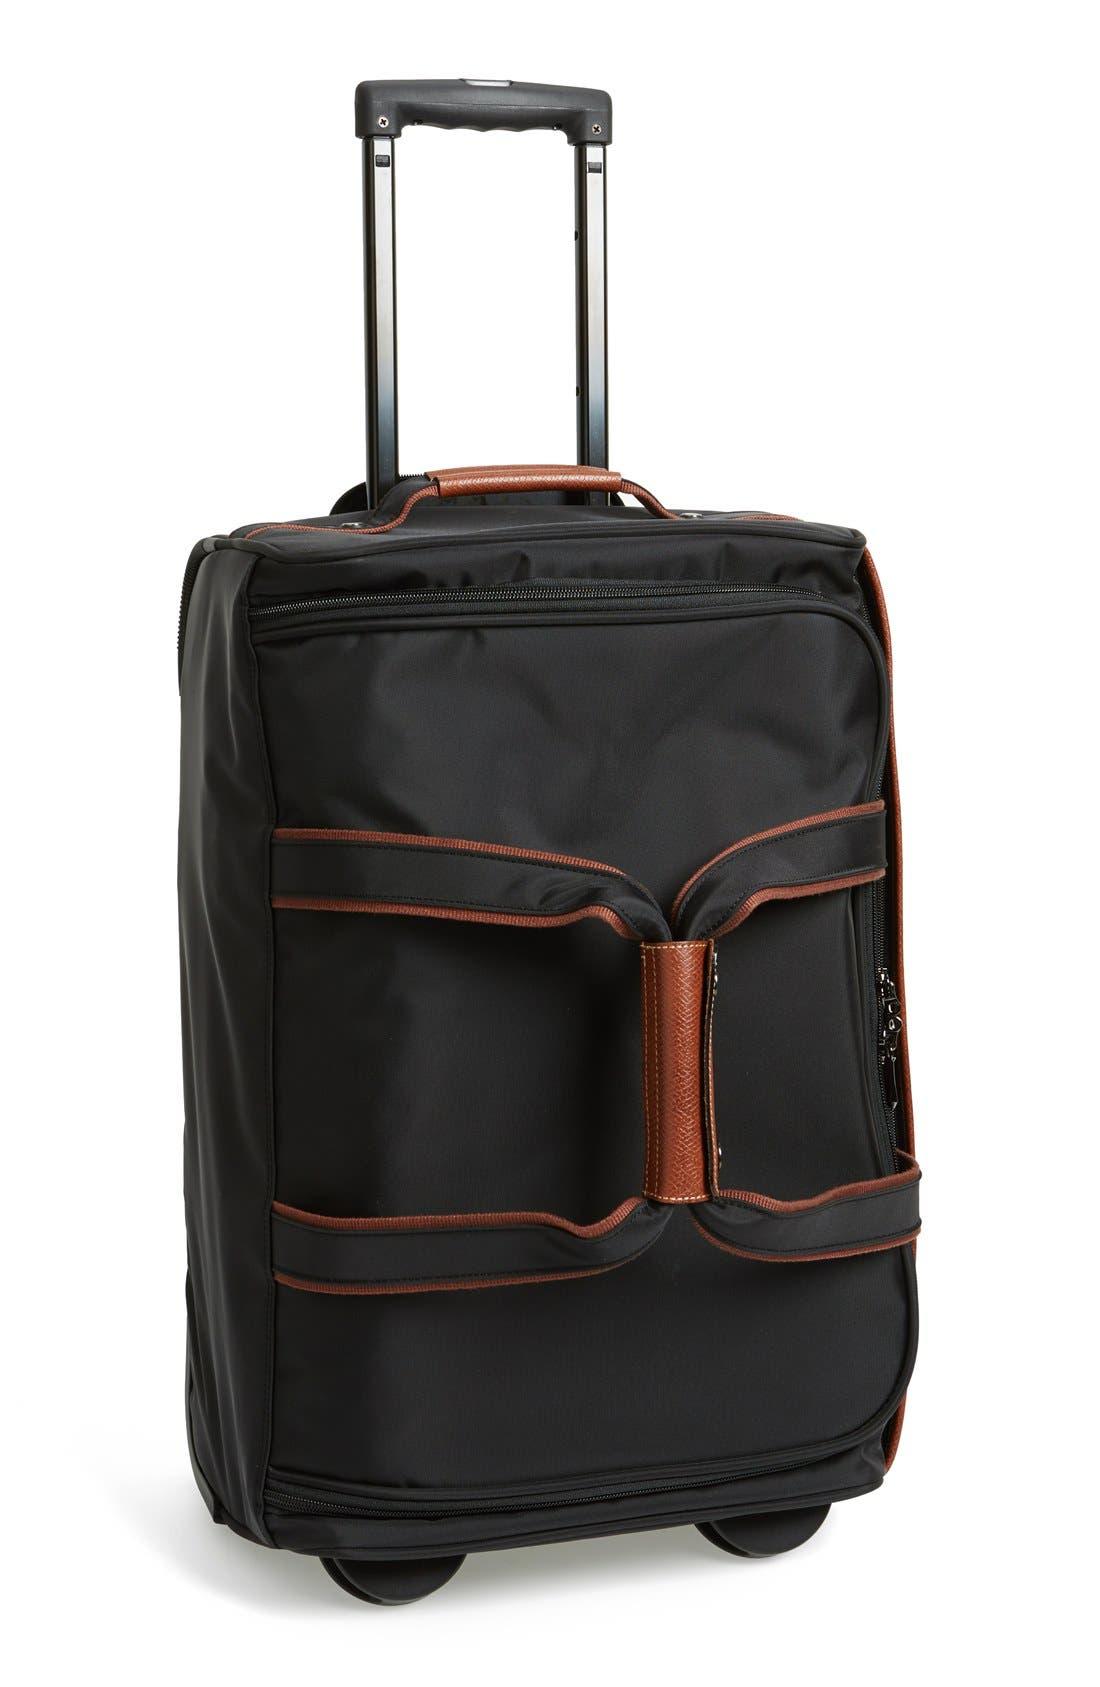 Alternate Image 1 Selected - Longchamp 'Small Le Pliage' Wheeled Travel Bag